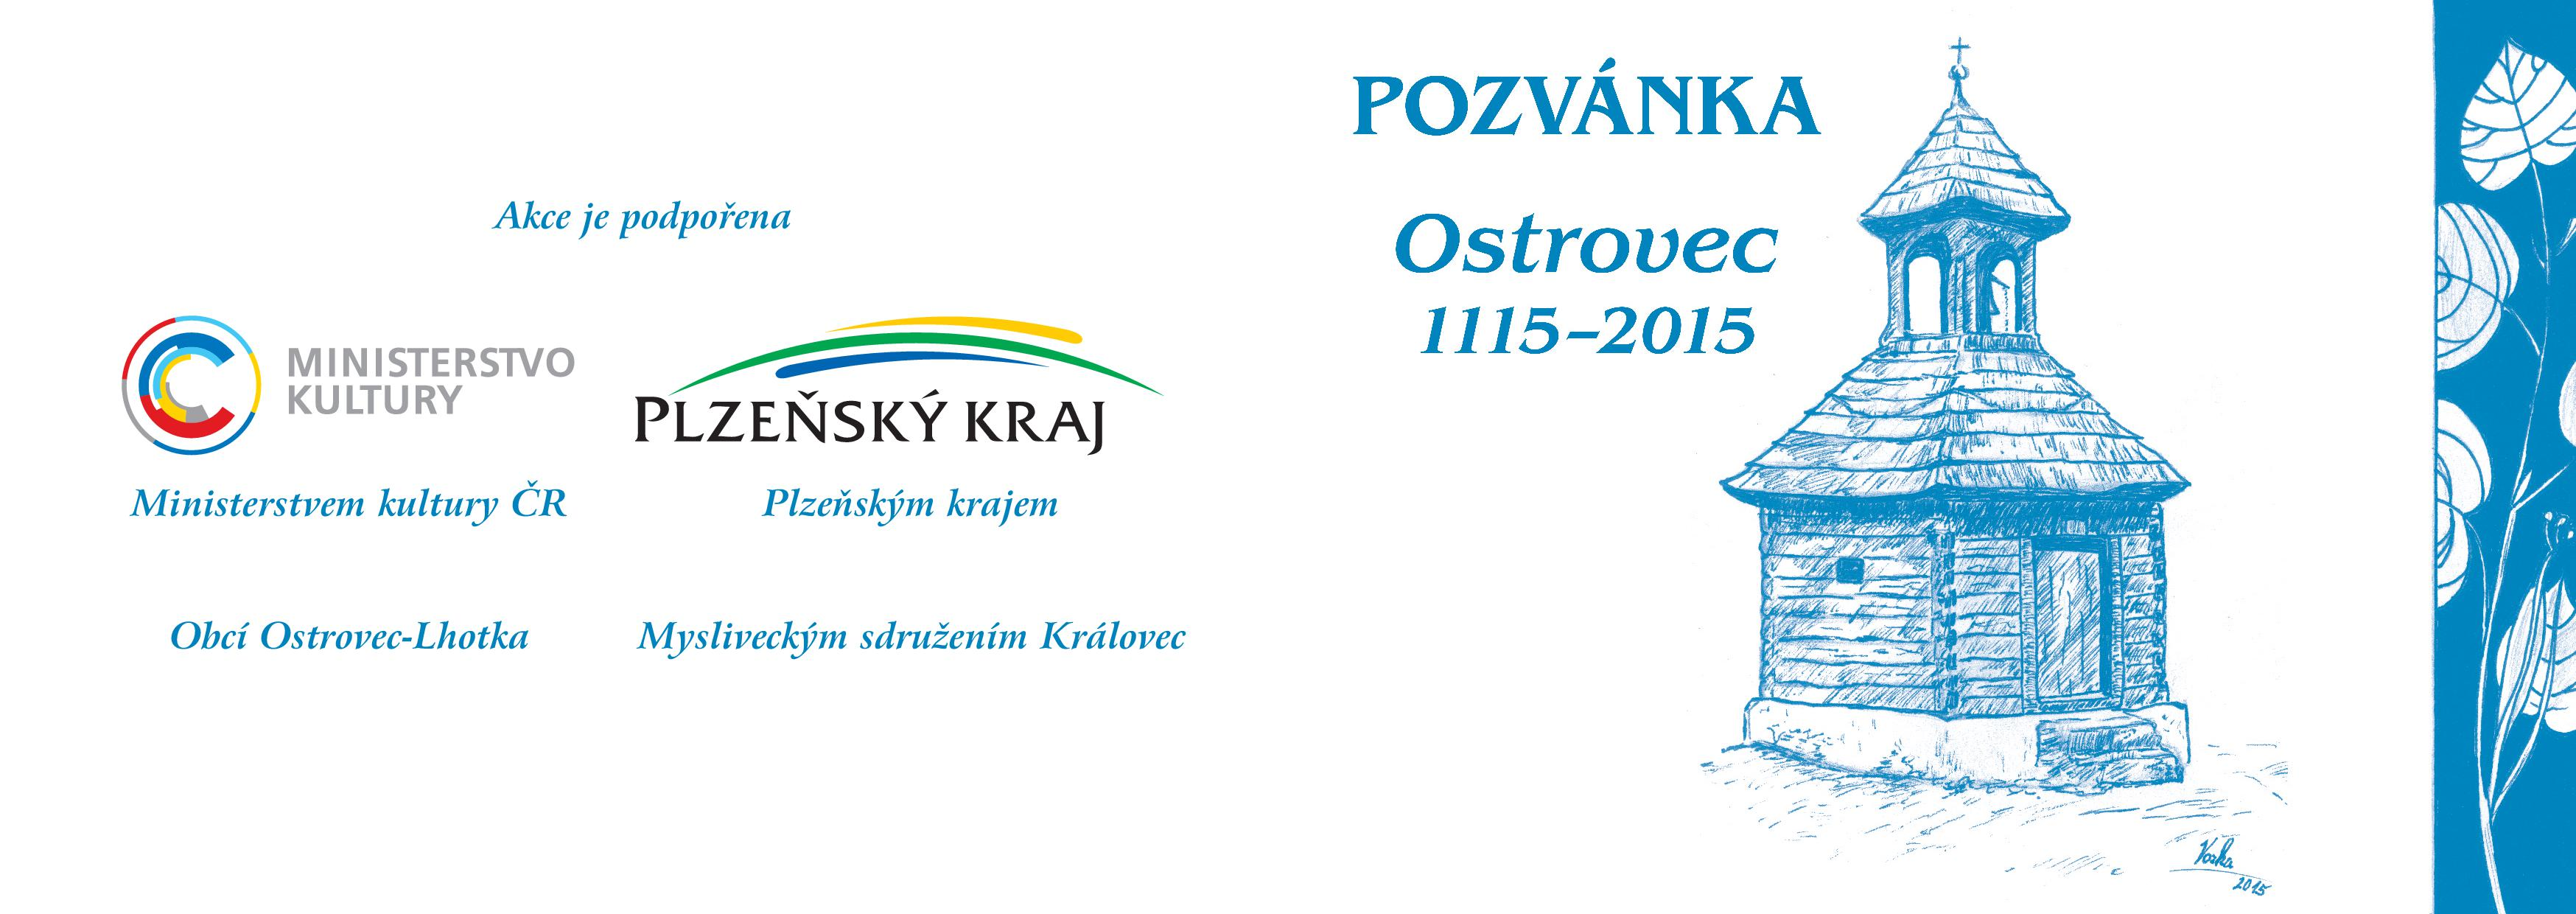 Ostrovec 1115-2015